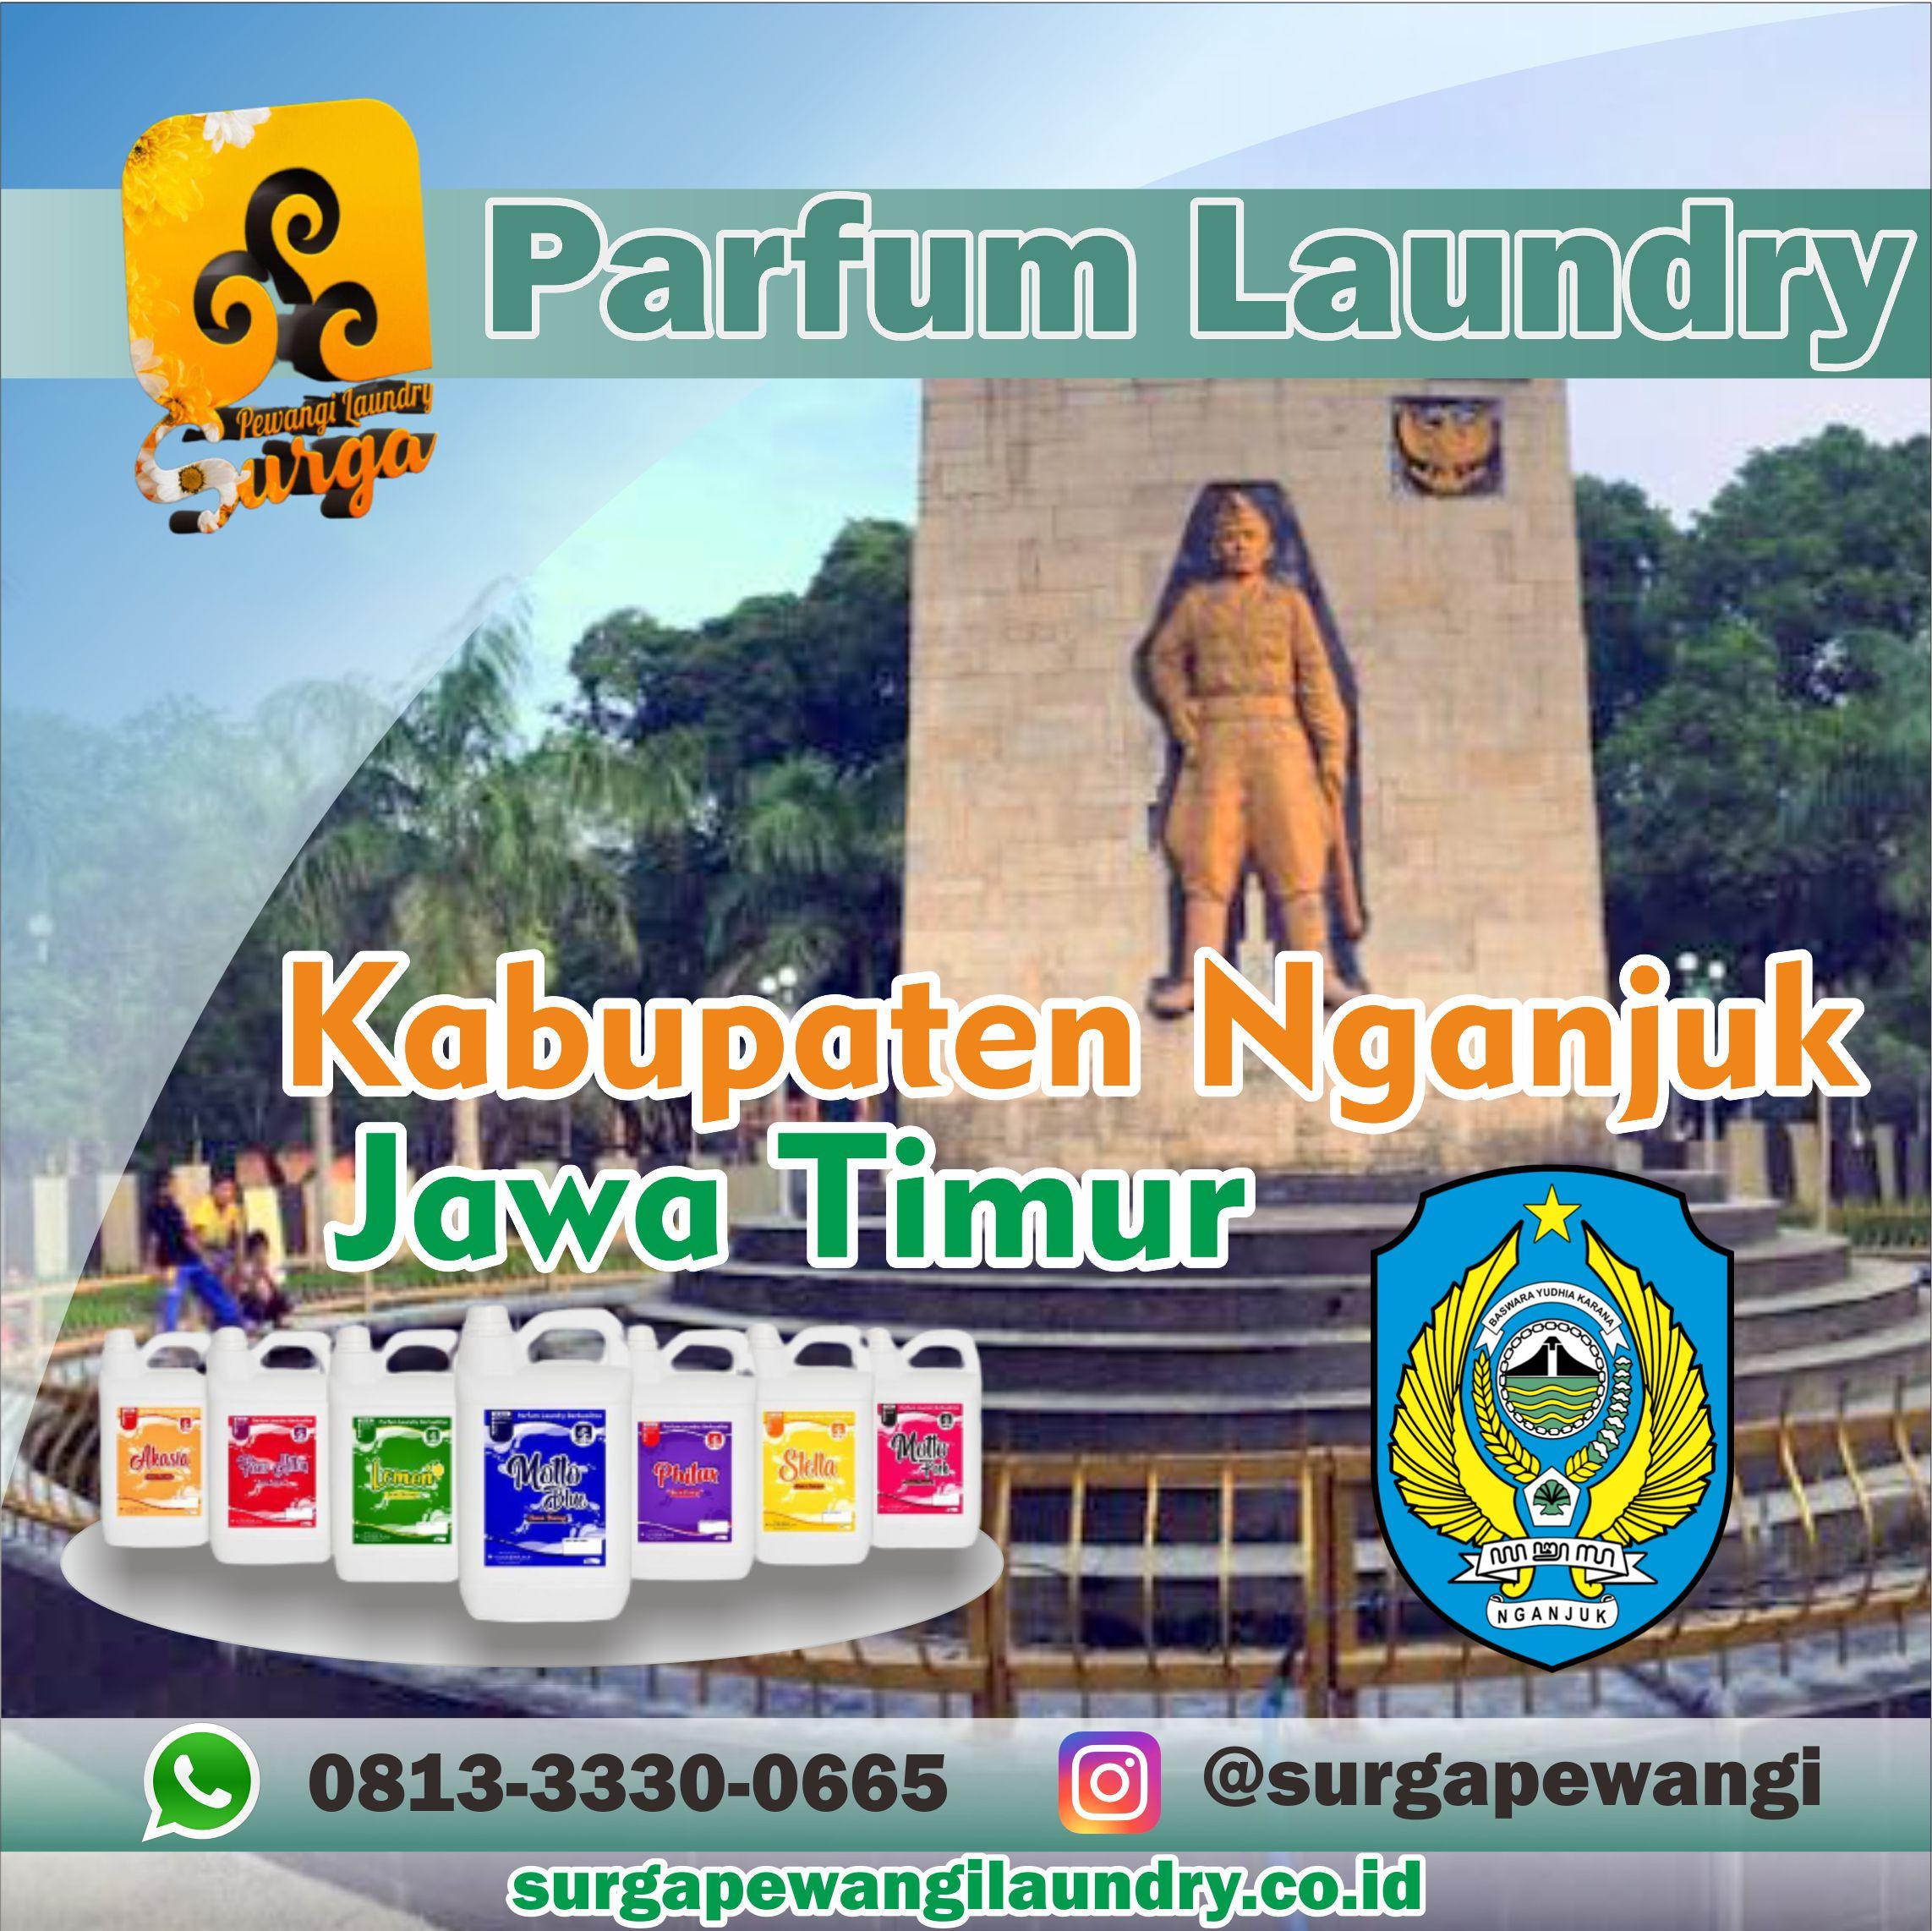 Parfum Laundry Nganjuk, Jawa Timur